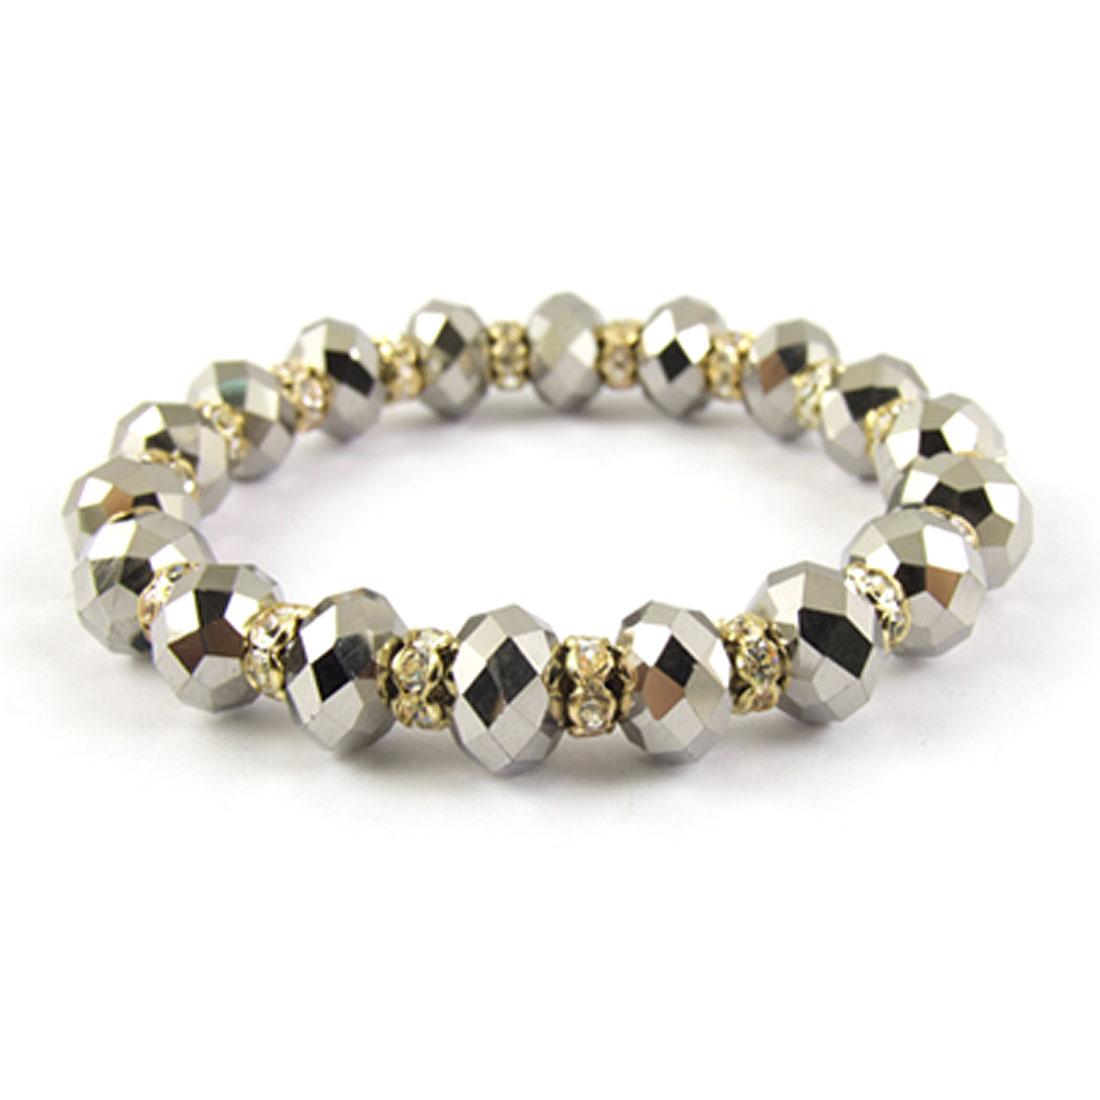 Rhinestone Decor Gray Plastic Faceted Crystal Elastic Bracelet